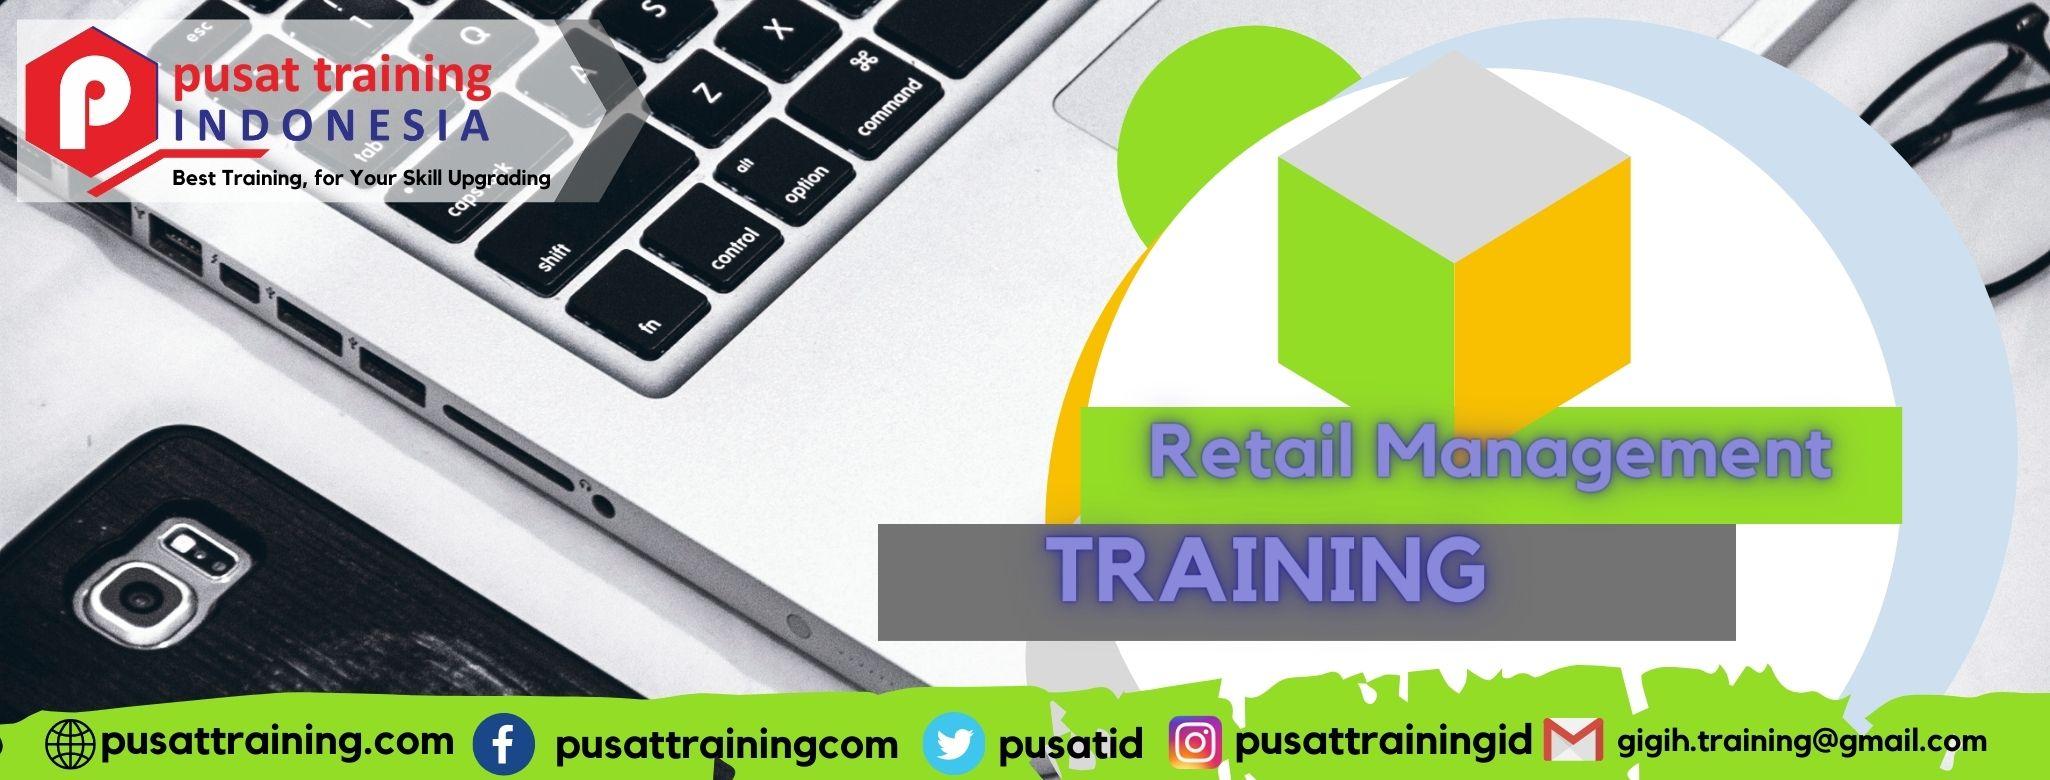 Pelatihan Retail Management